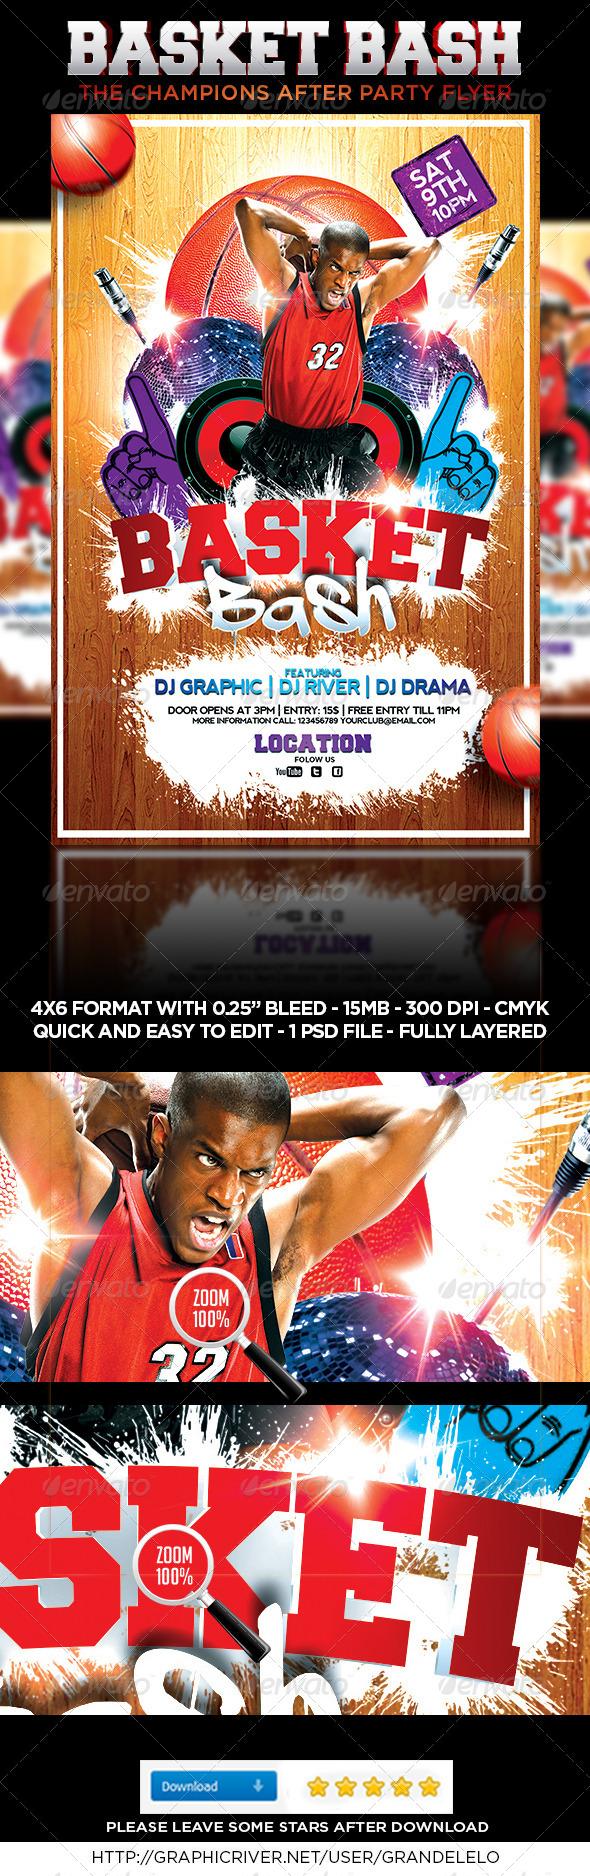 Basketball Bash Flyer - Sports Events